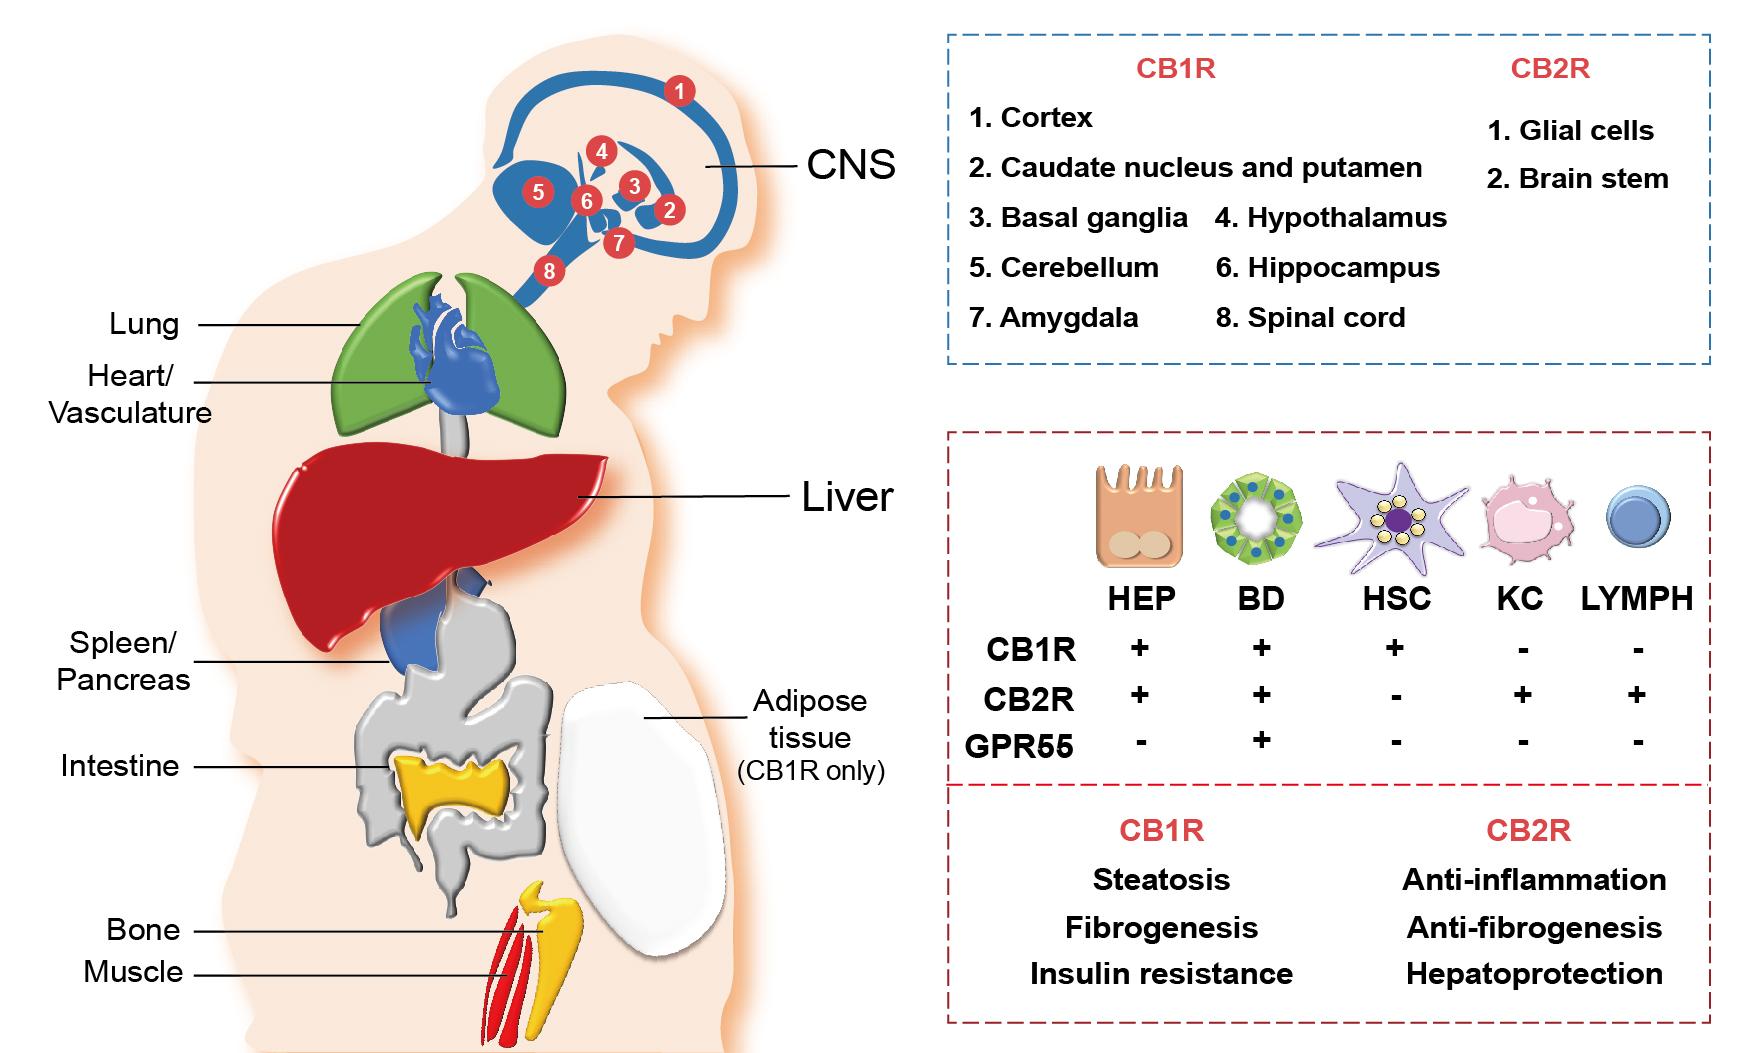 Distribution of cannabinoid receptors in various organs and hepatic cells.